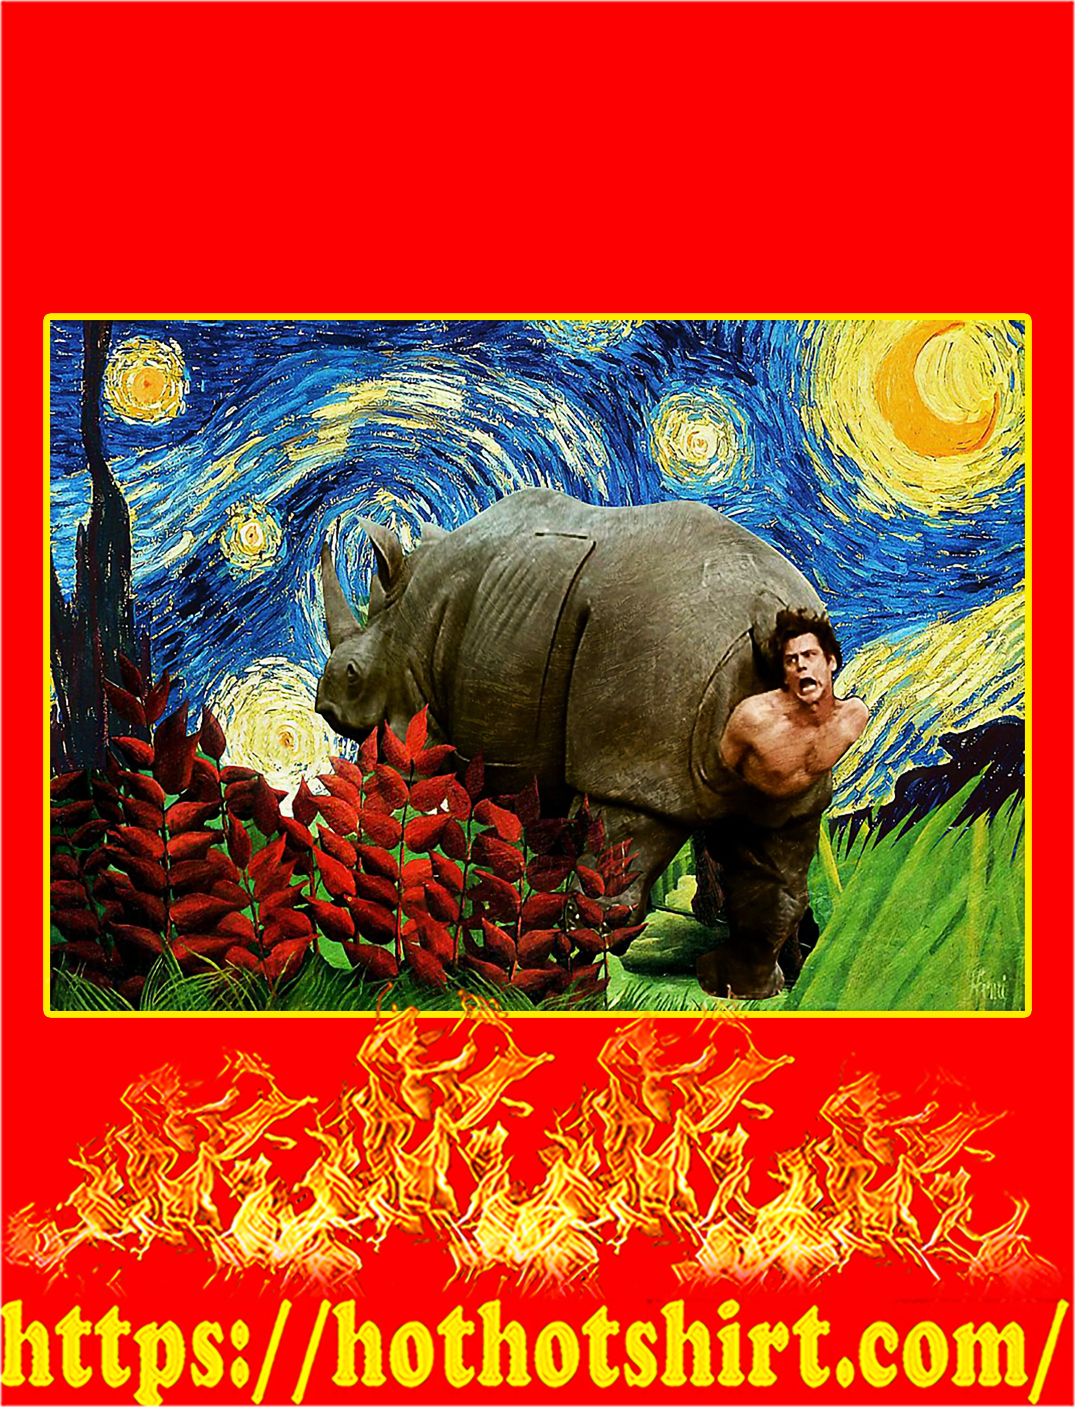 Rhino scene ace ventura starry night van gogh poster - A3